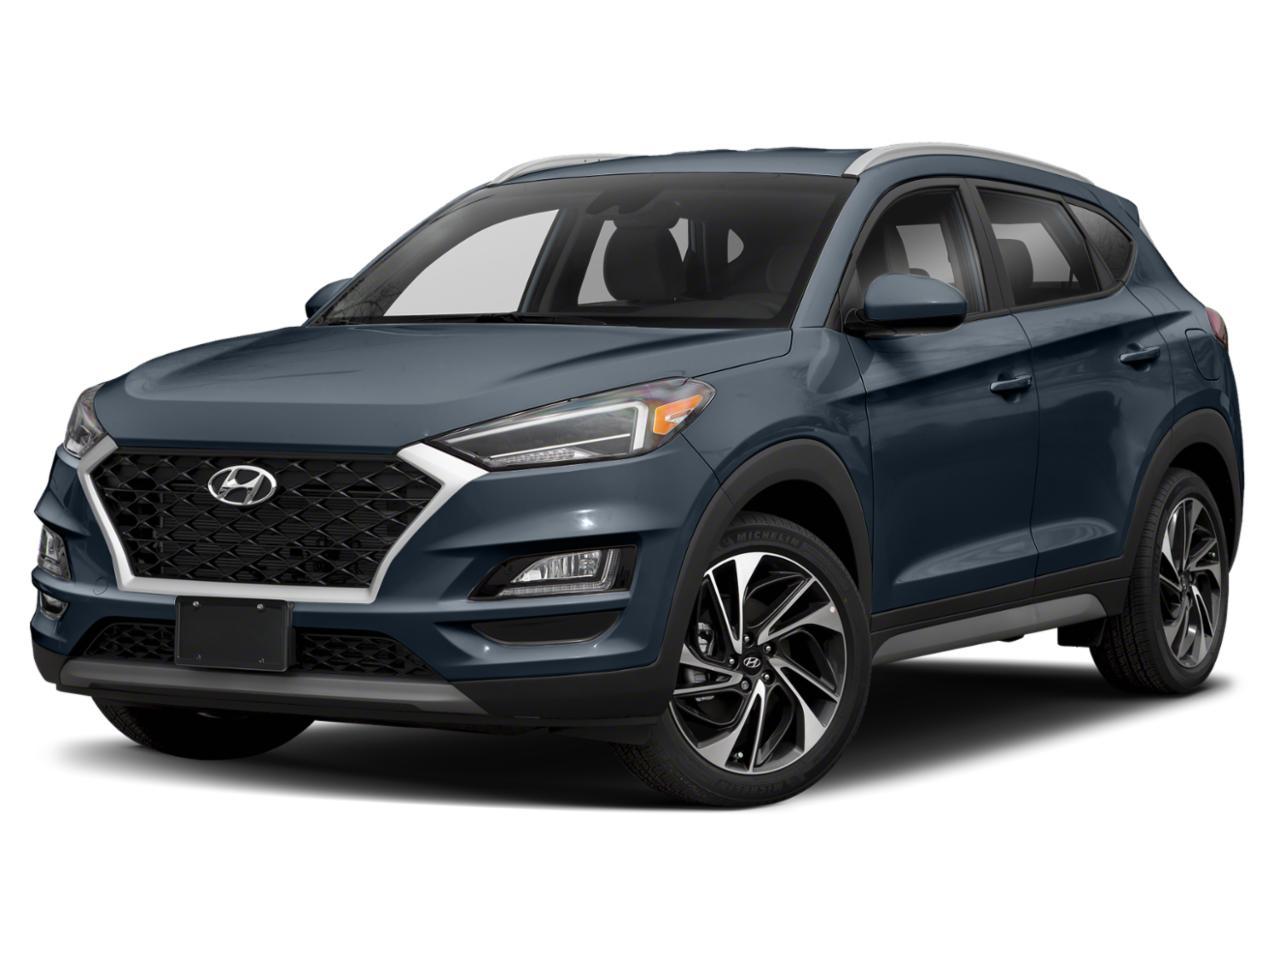 2019 Hyundai Tucson Vehicle Photo in Plainfield, IL 60586